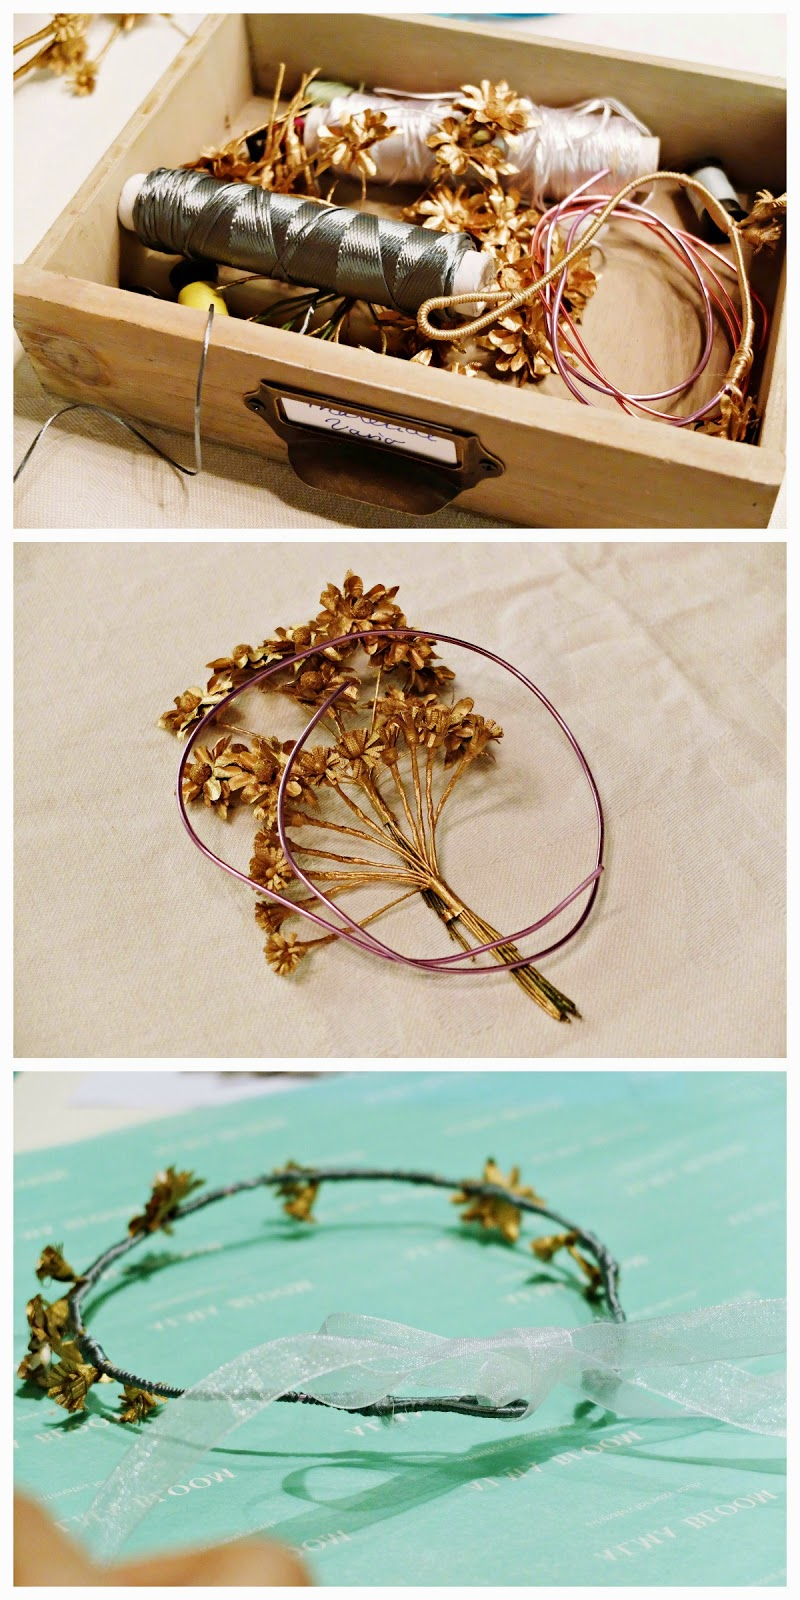 Cantuc tocados, coronas, canotiers, chisteras - Fotografia realizada con Fujifilm X30 #esFujifilmX